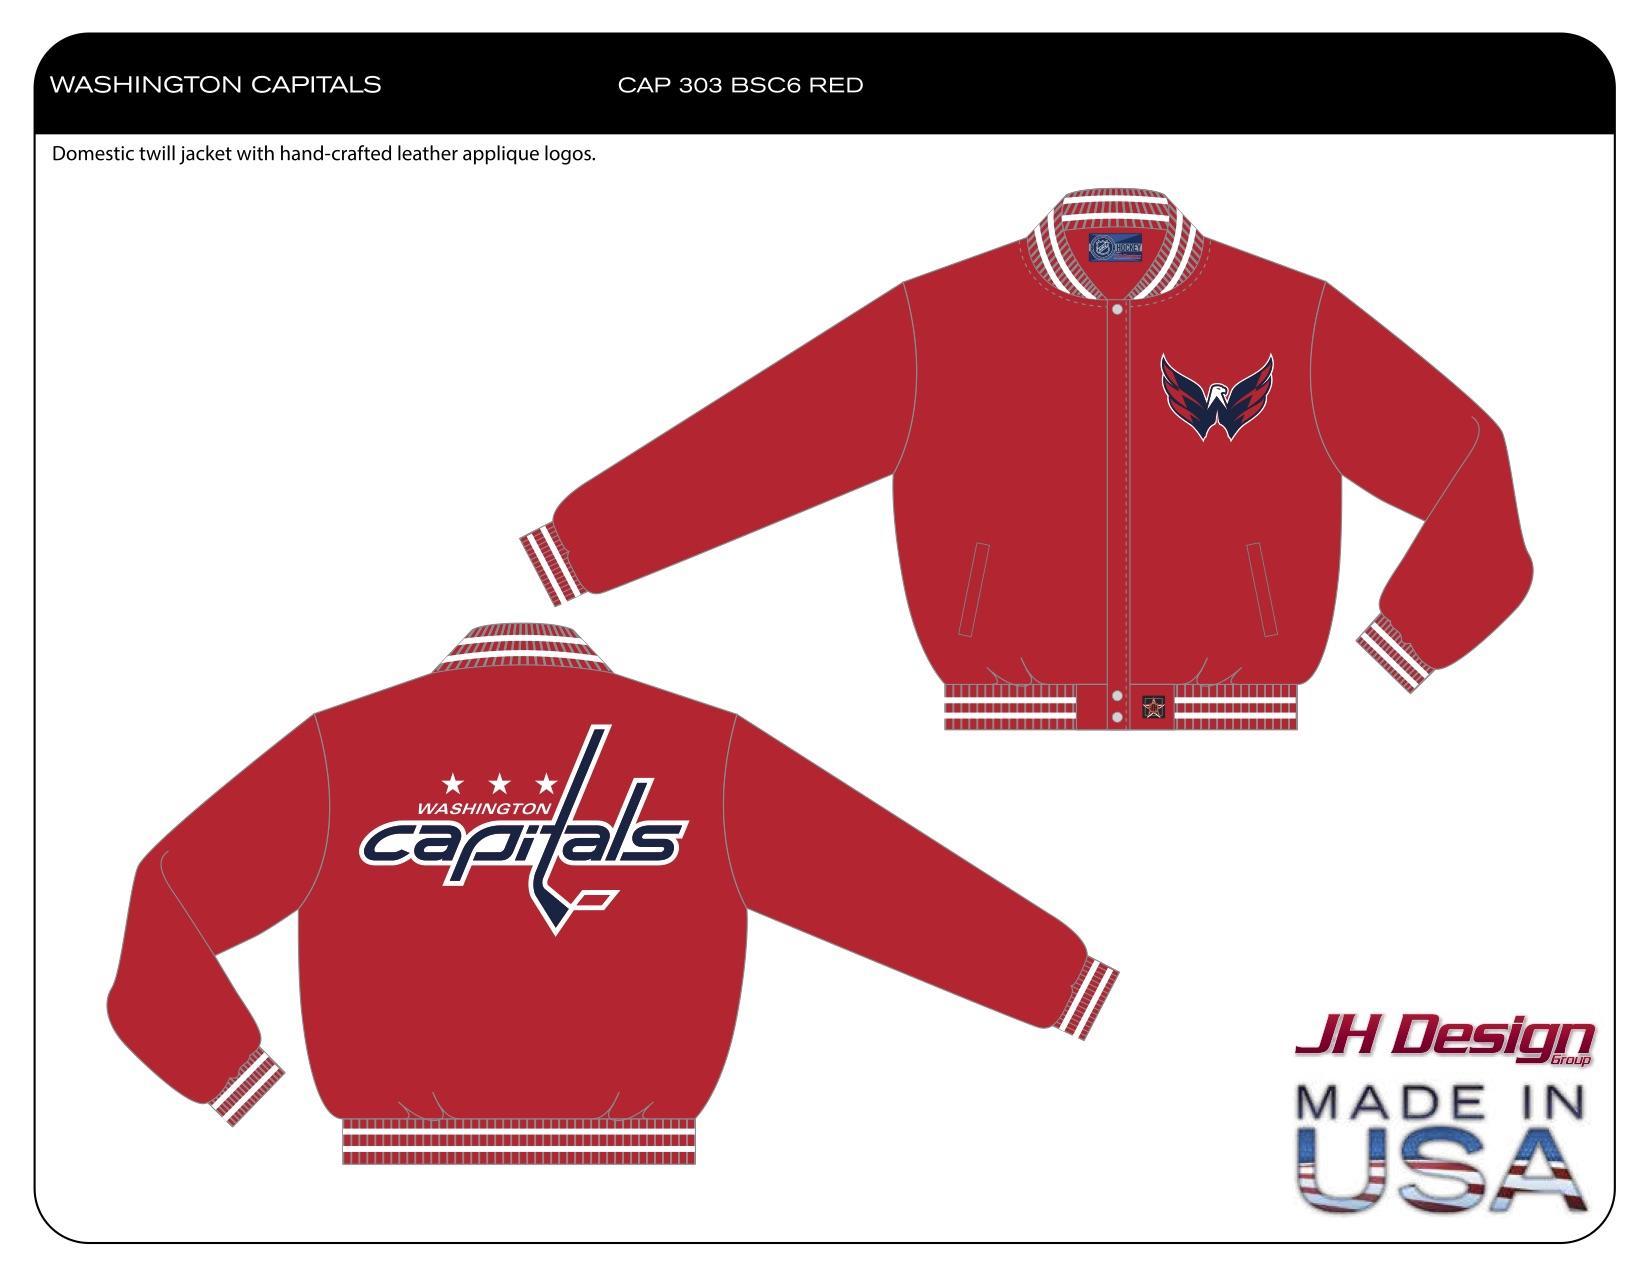 CAP 303 BSC6 RED